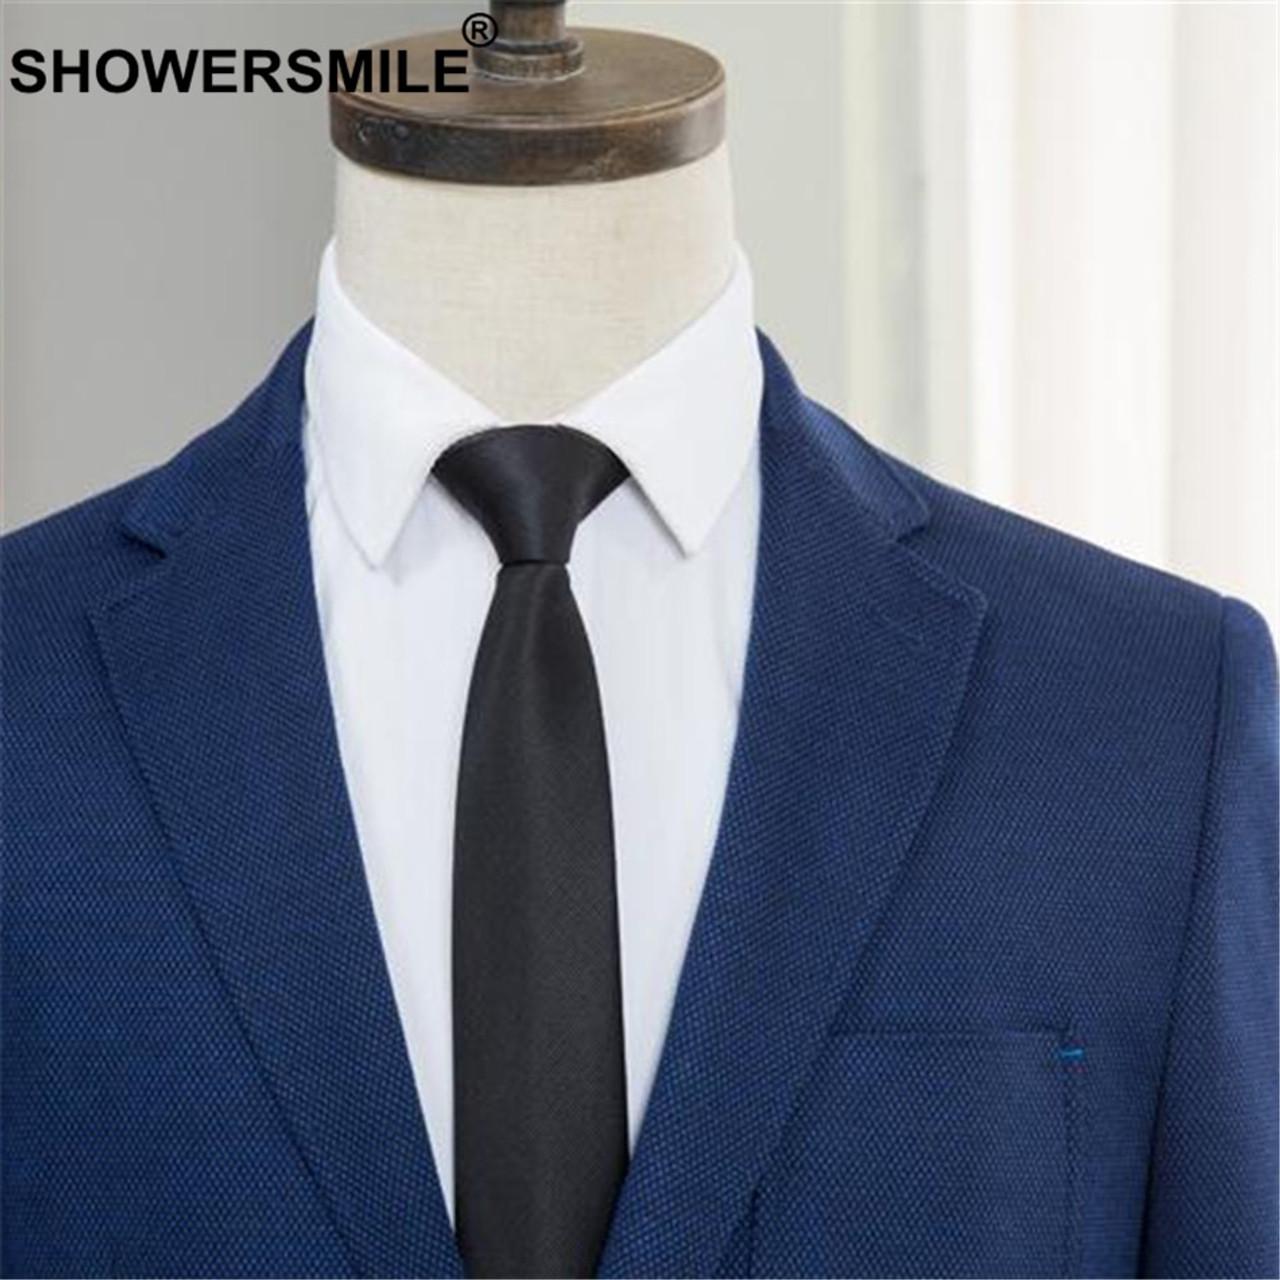 6ca56959359f6 SHOWERSMILE Brand Smart Casual Blazer Men Slim Fit Blue Suit Jacket Male  Gentlemen Plus Size Blazer Jacket Autumn Wedding Coat